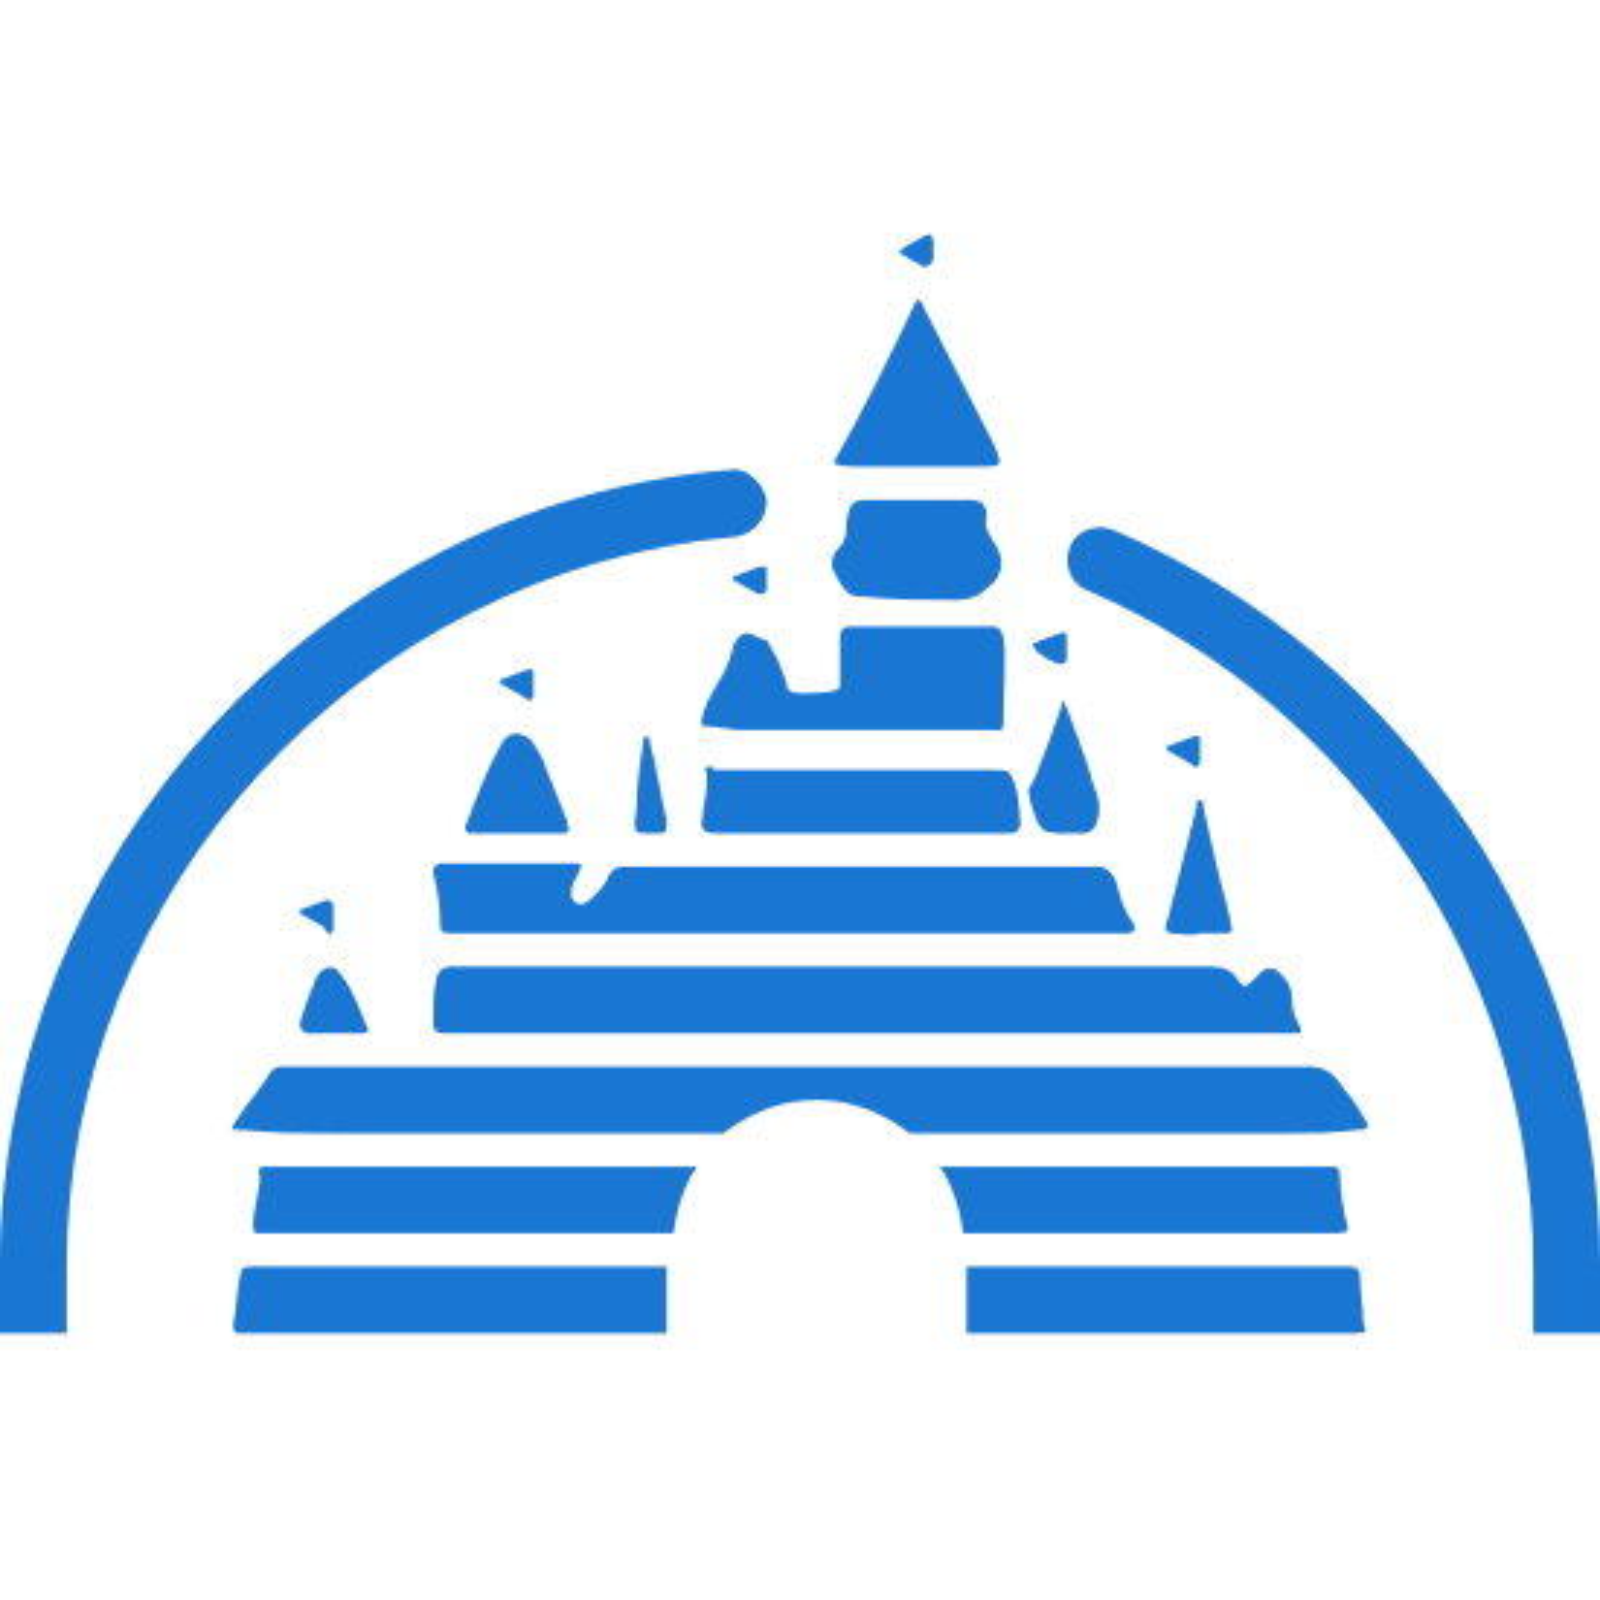 Filmy Disneya icon